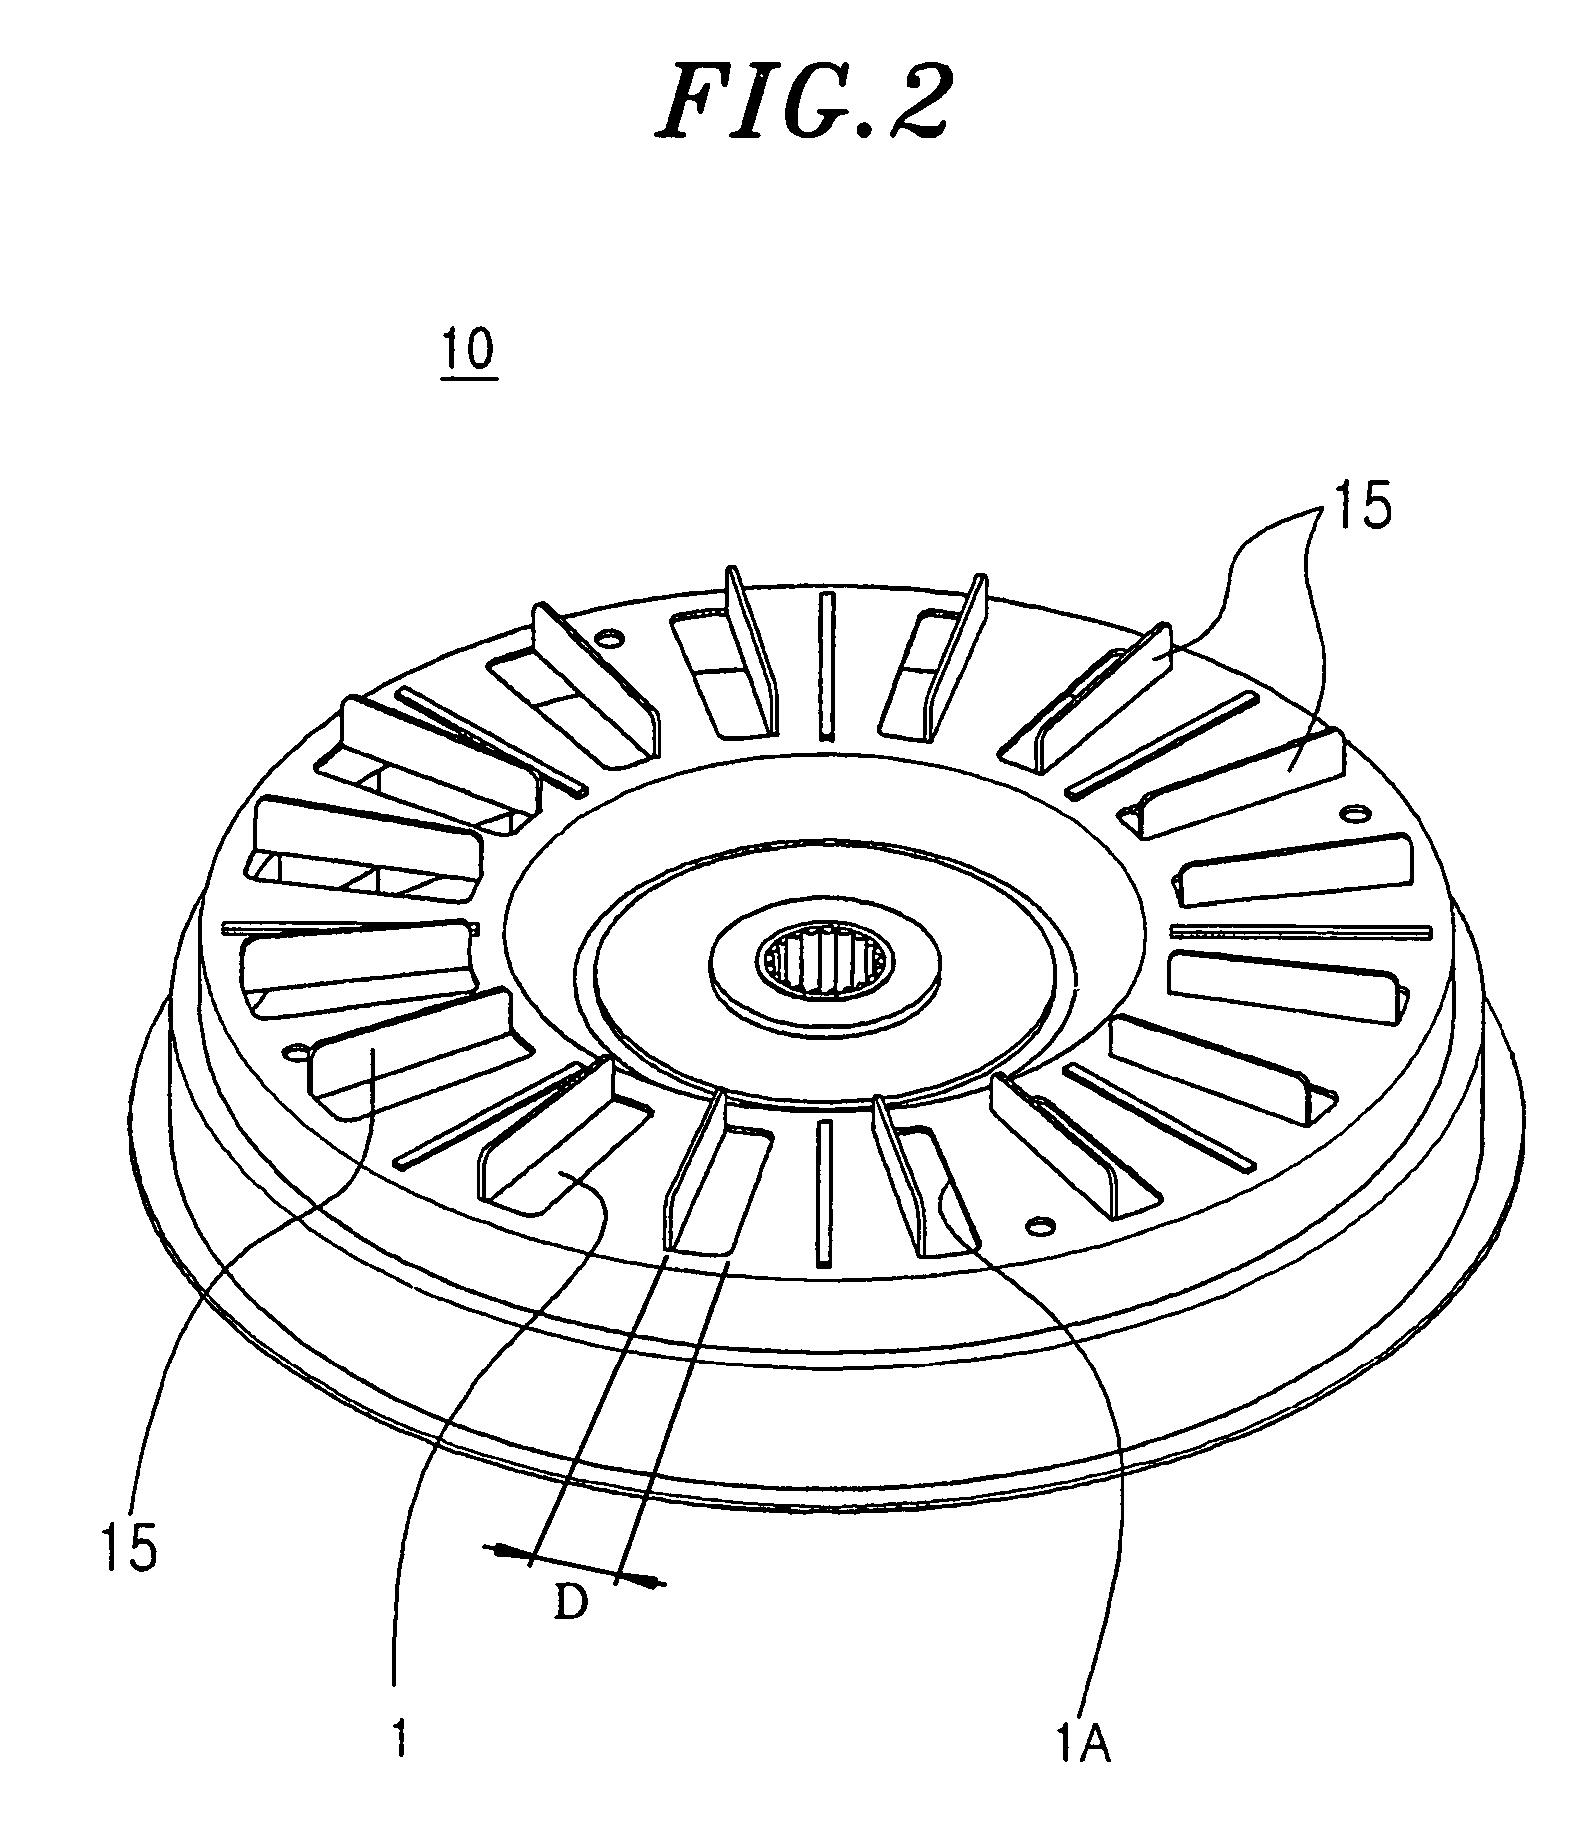 Water Control Valve Wiring Diagram For Roper Washing